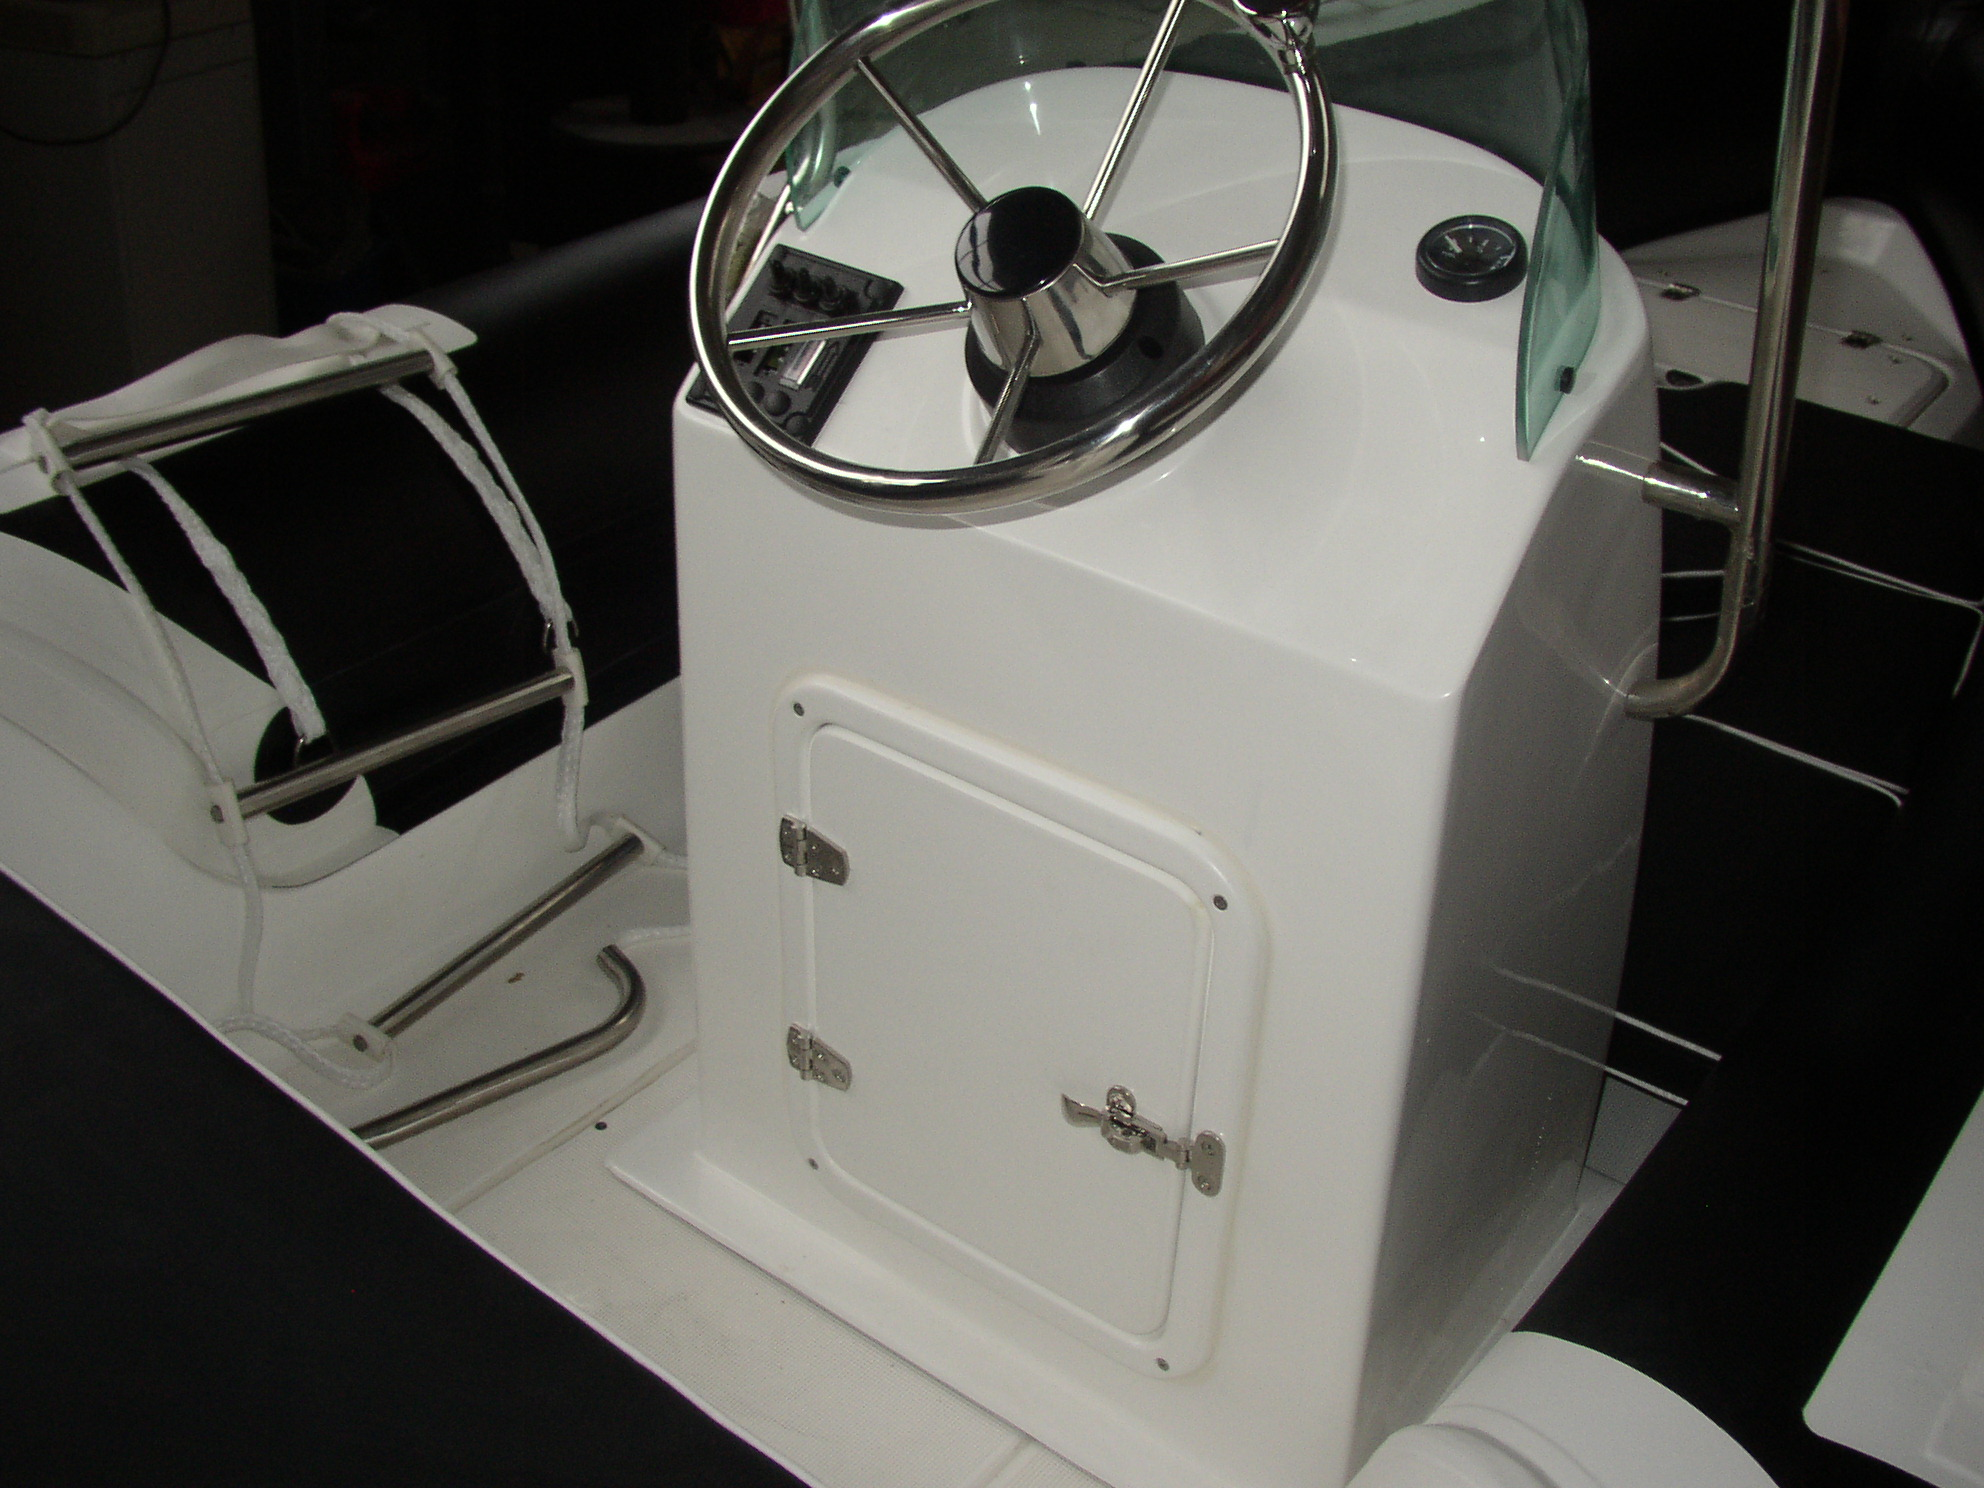 HP-470 Grau / Grau mit Aluboden